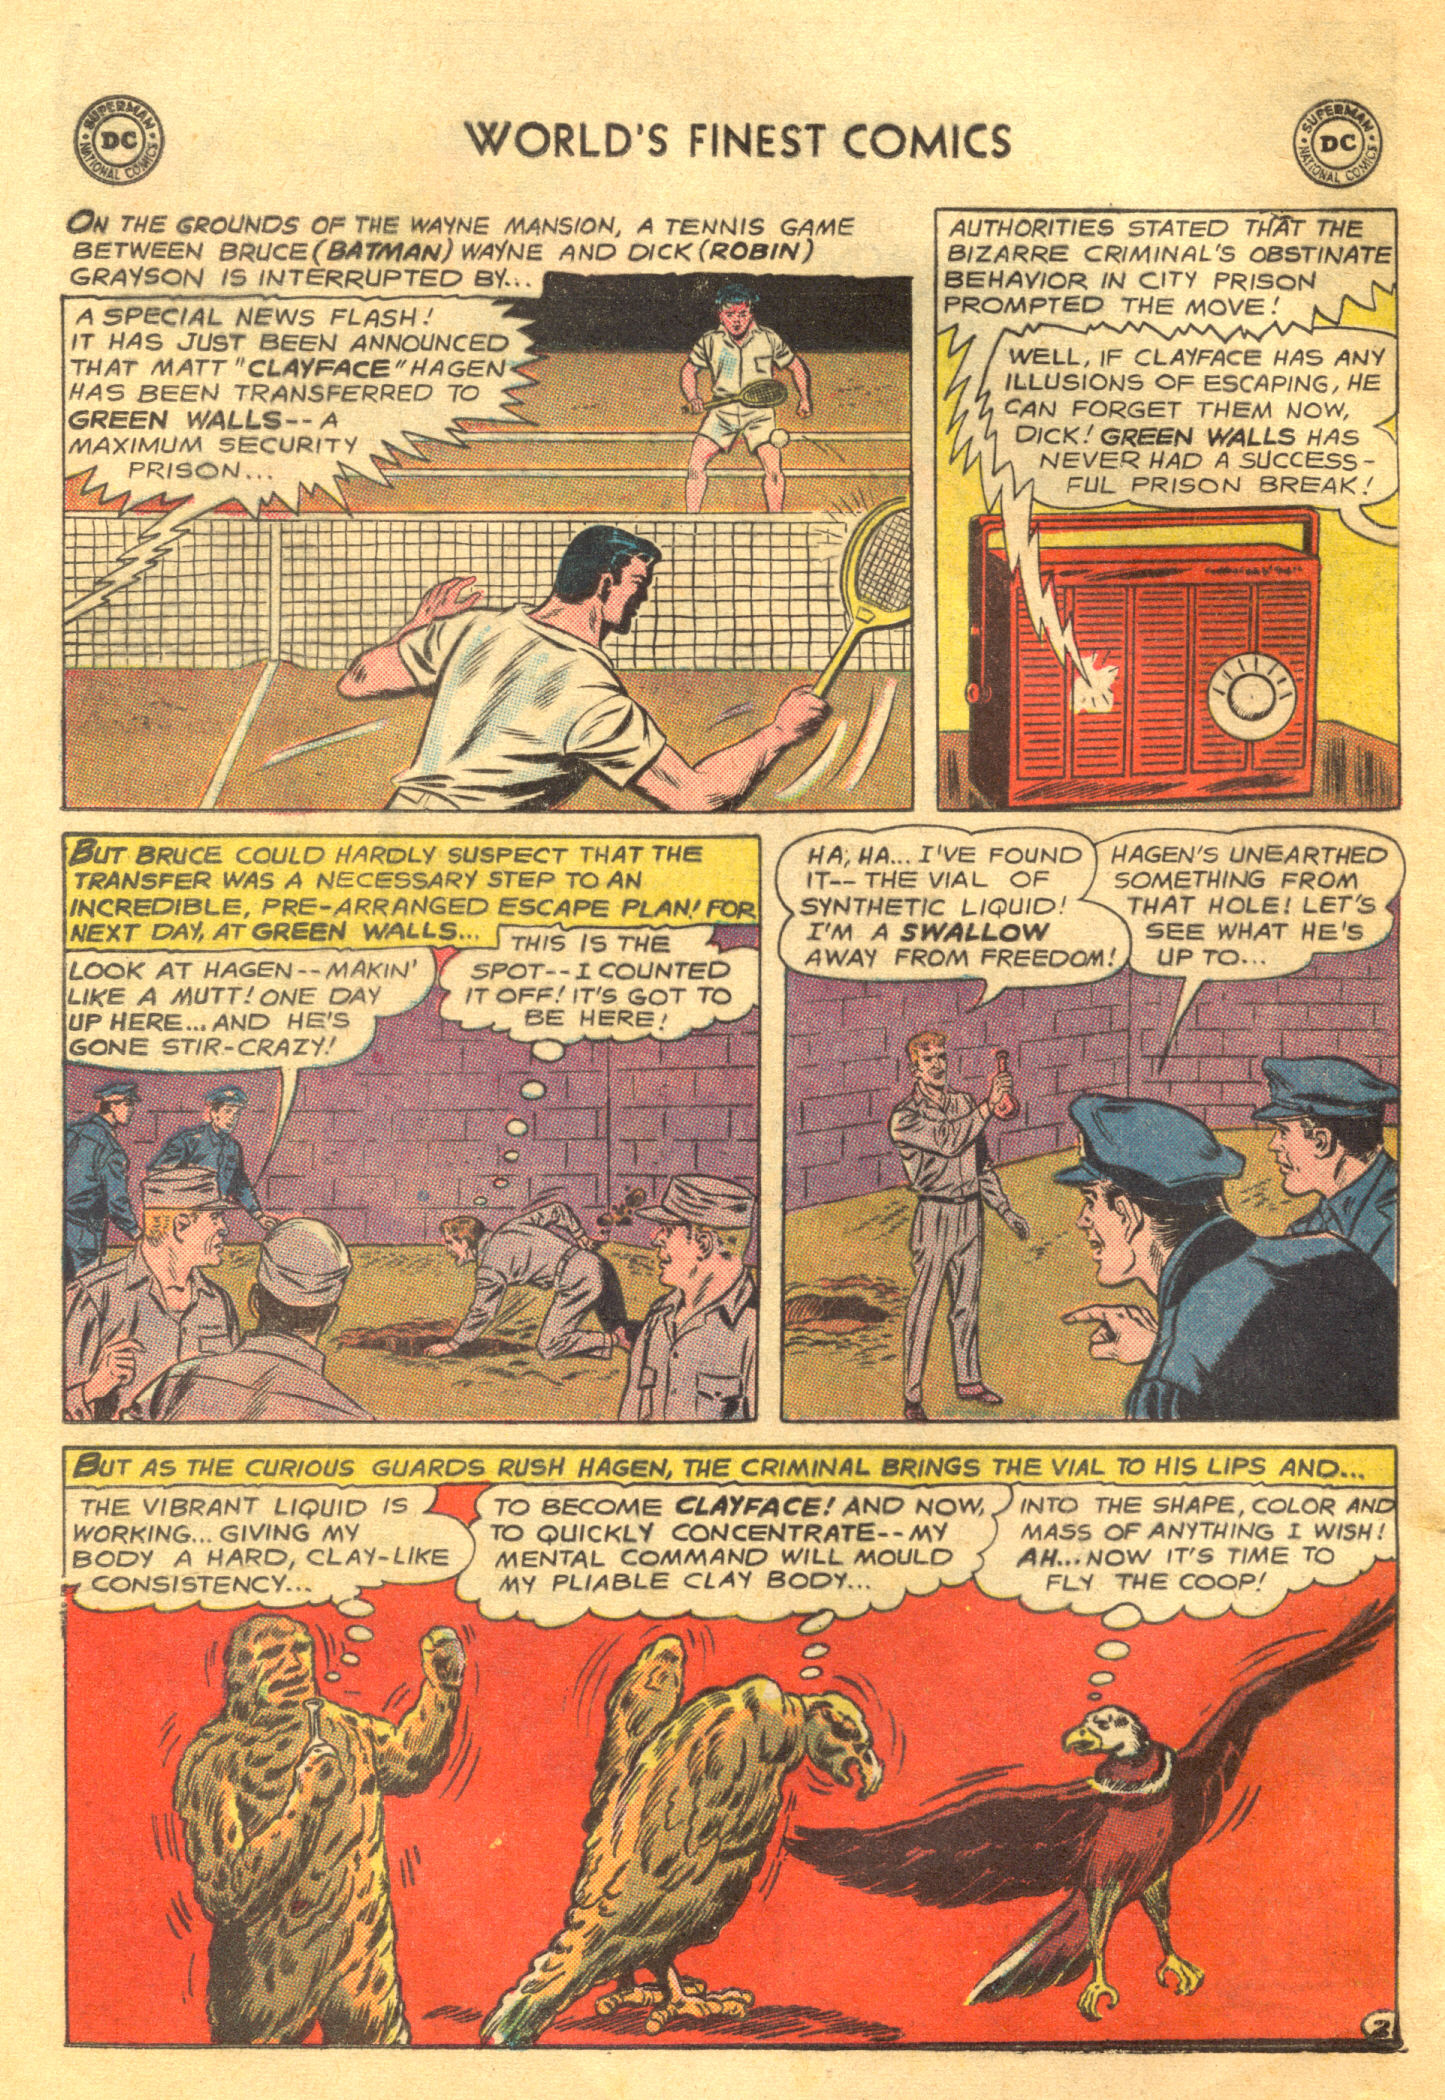 Read online World's Finest Comics comic -  Issue #140 - 4